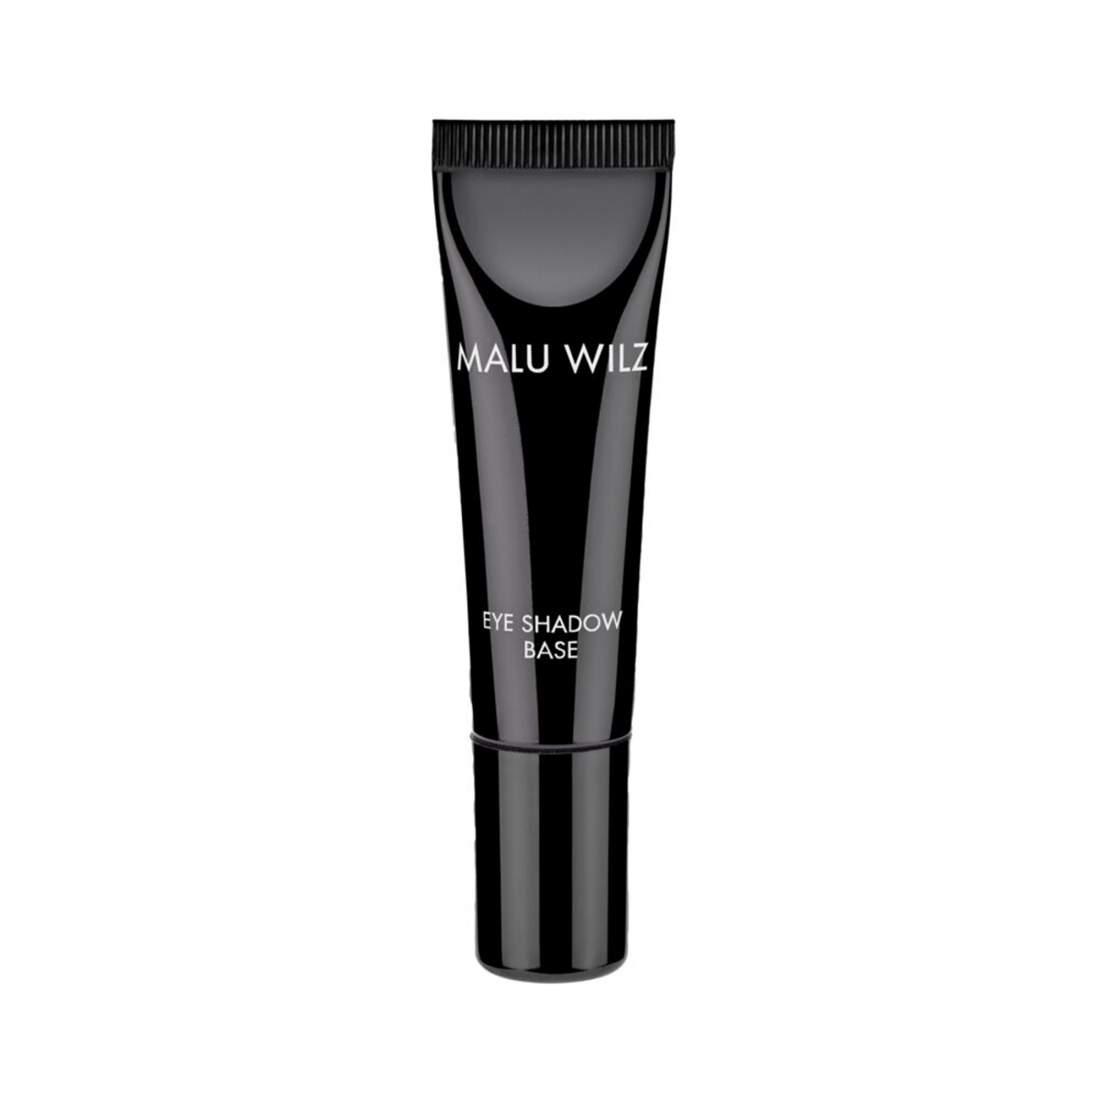 Szemhéjpúder alapozó - Malu Wilz Eyeshadow Base